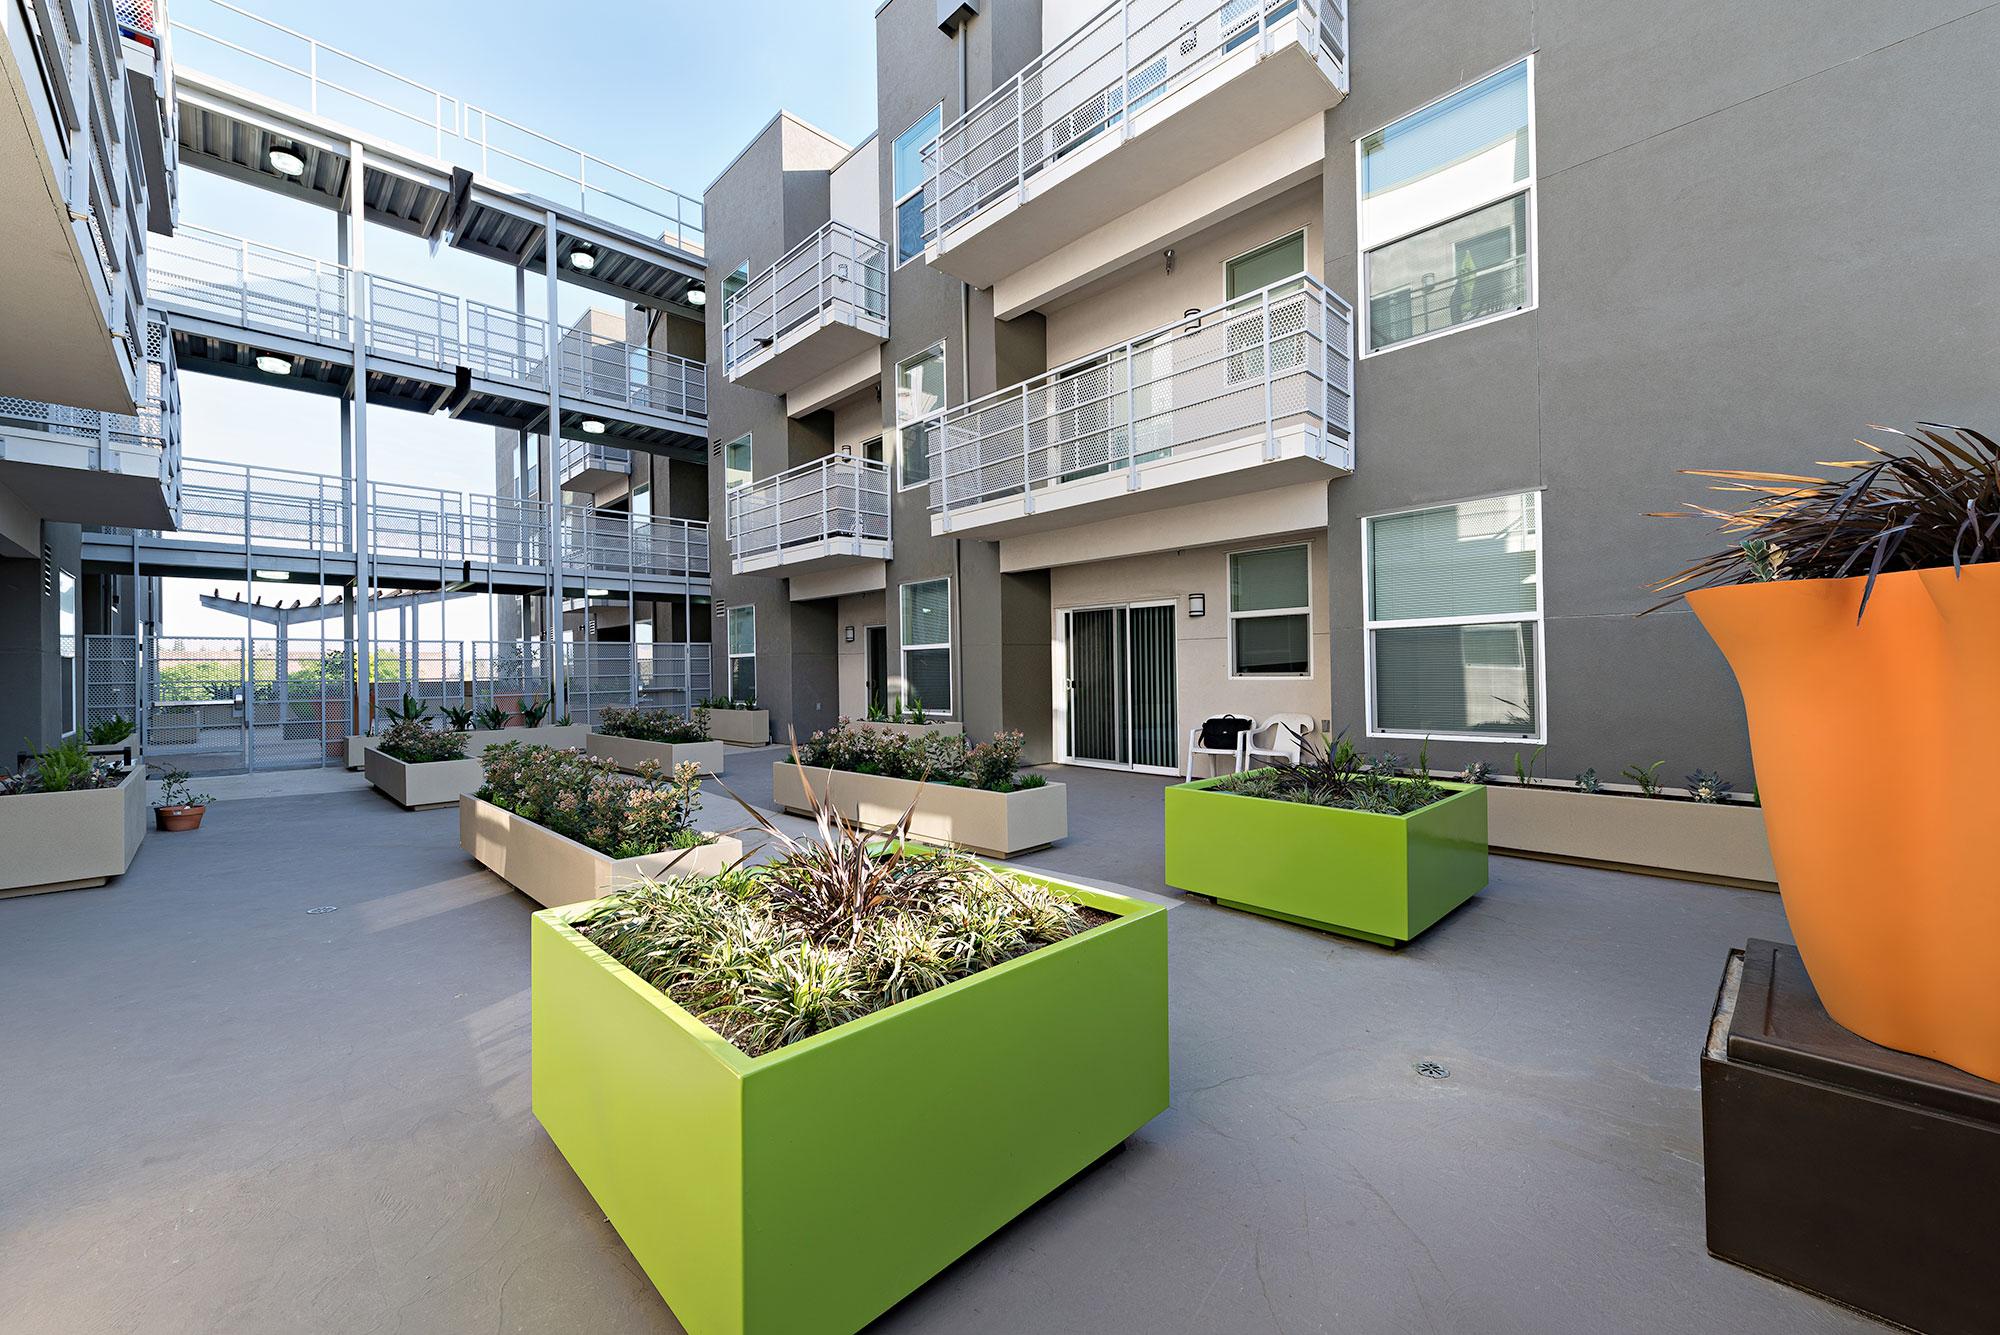 City View At Van Ness Mogavero Architects